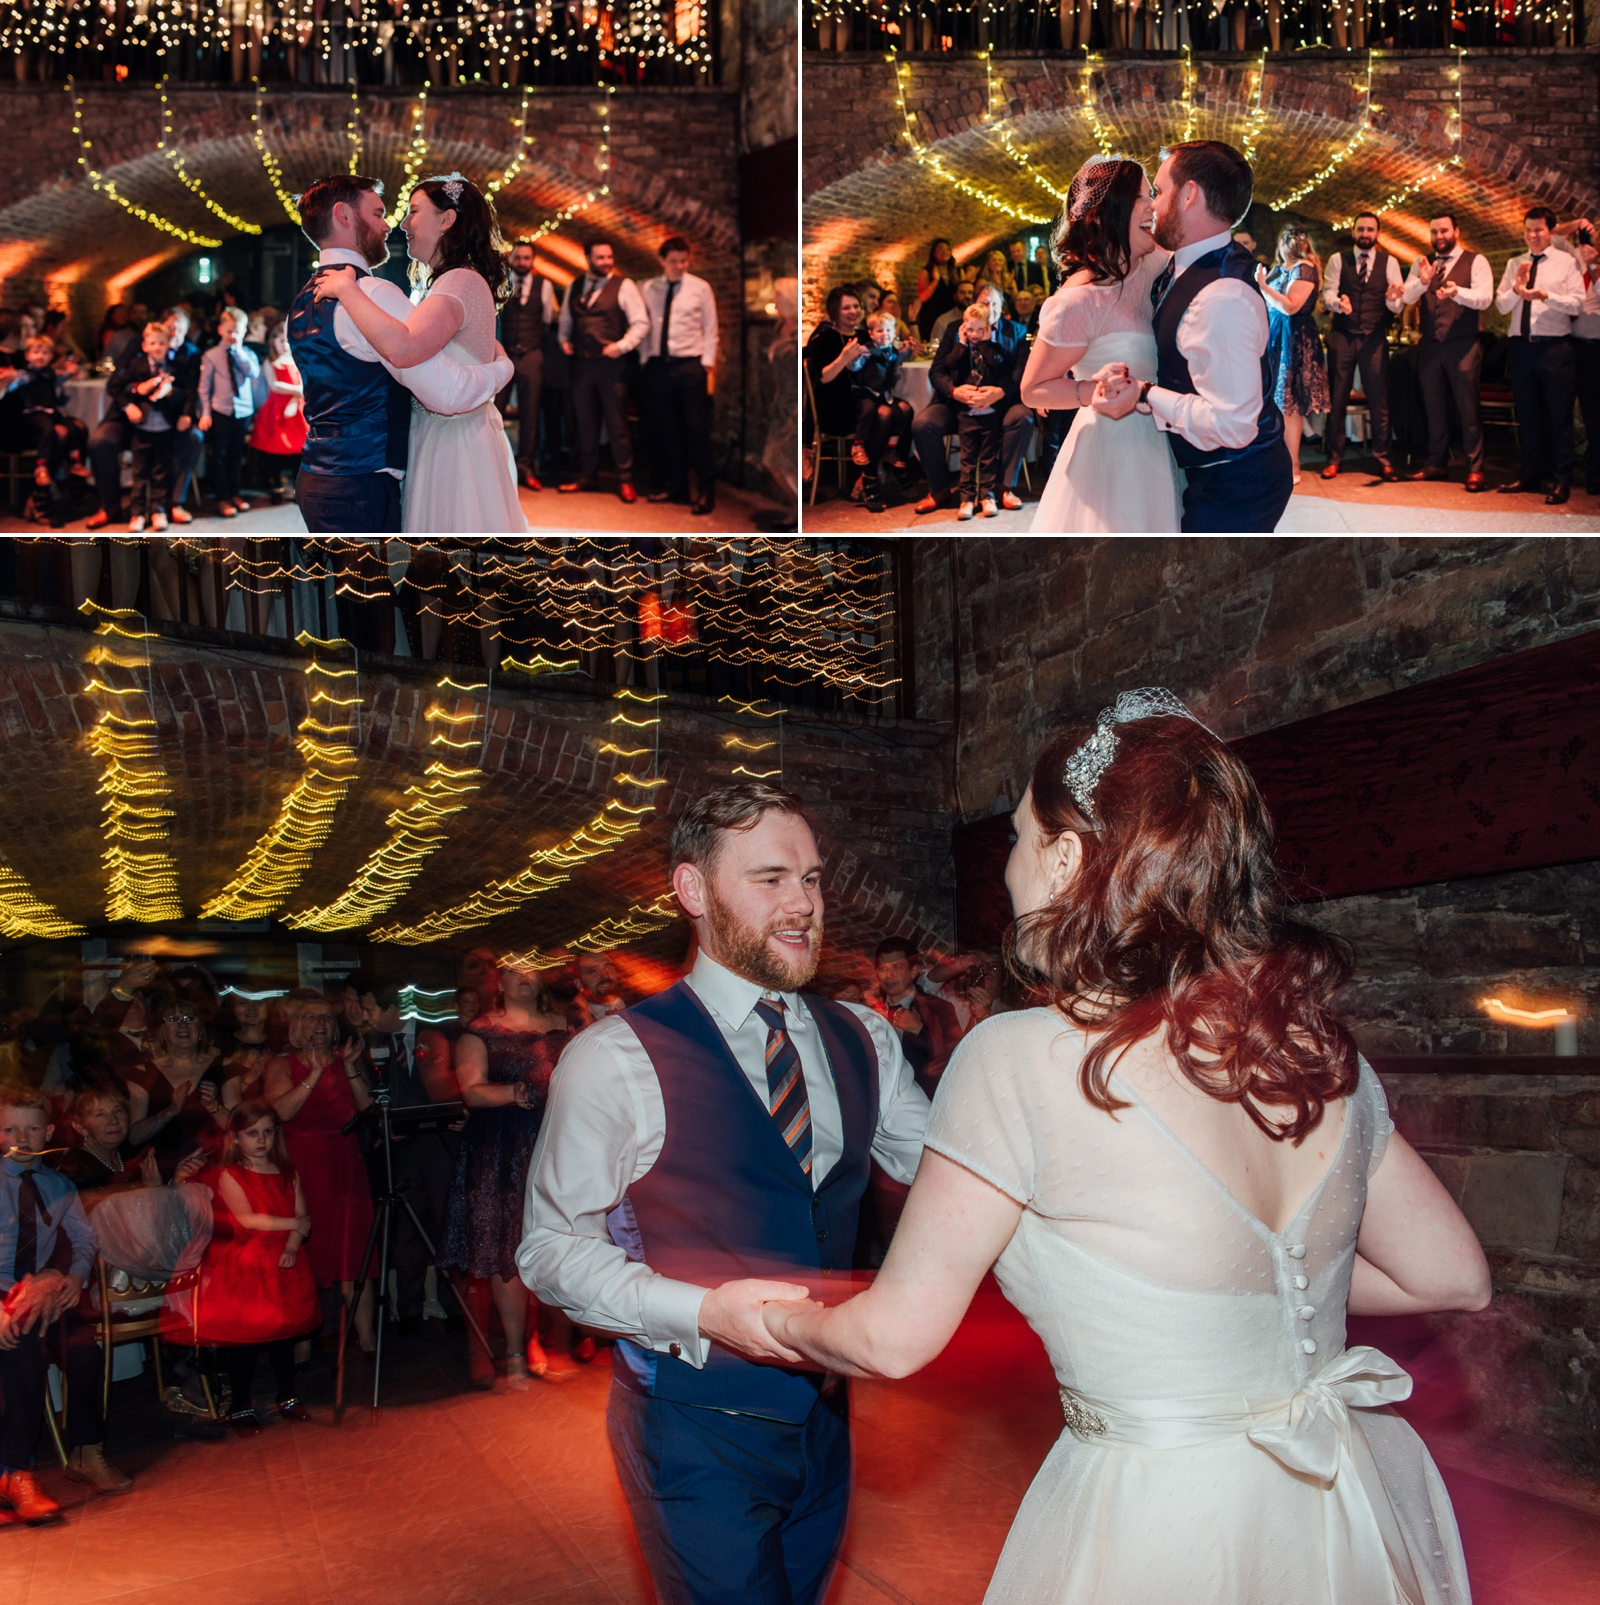 thecaves_retro_DIY_wedding_00117.jpg